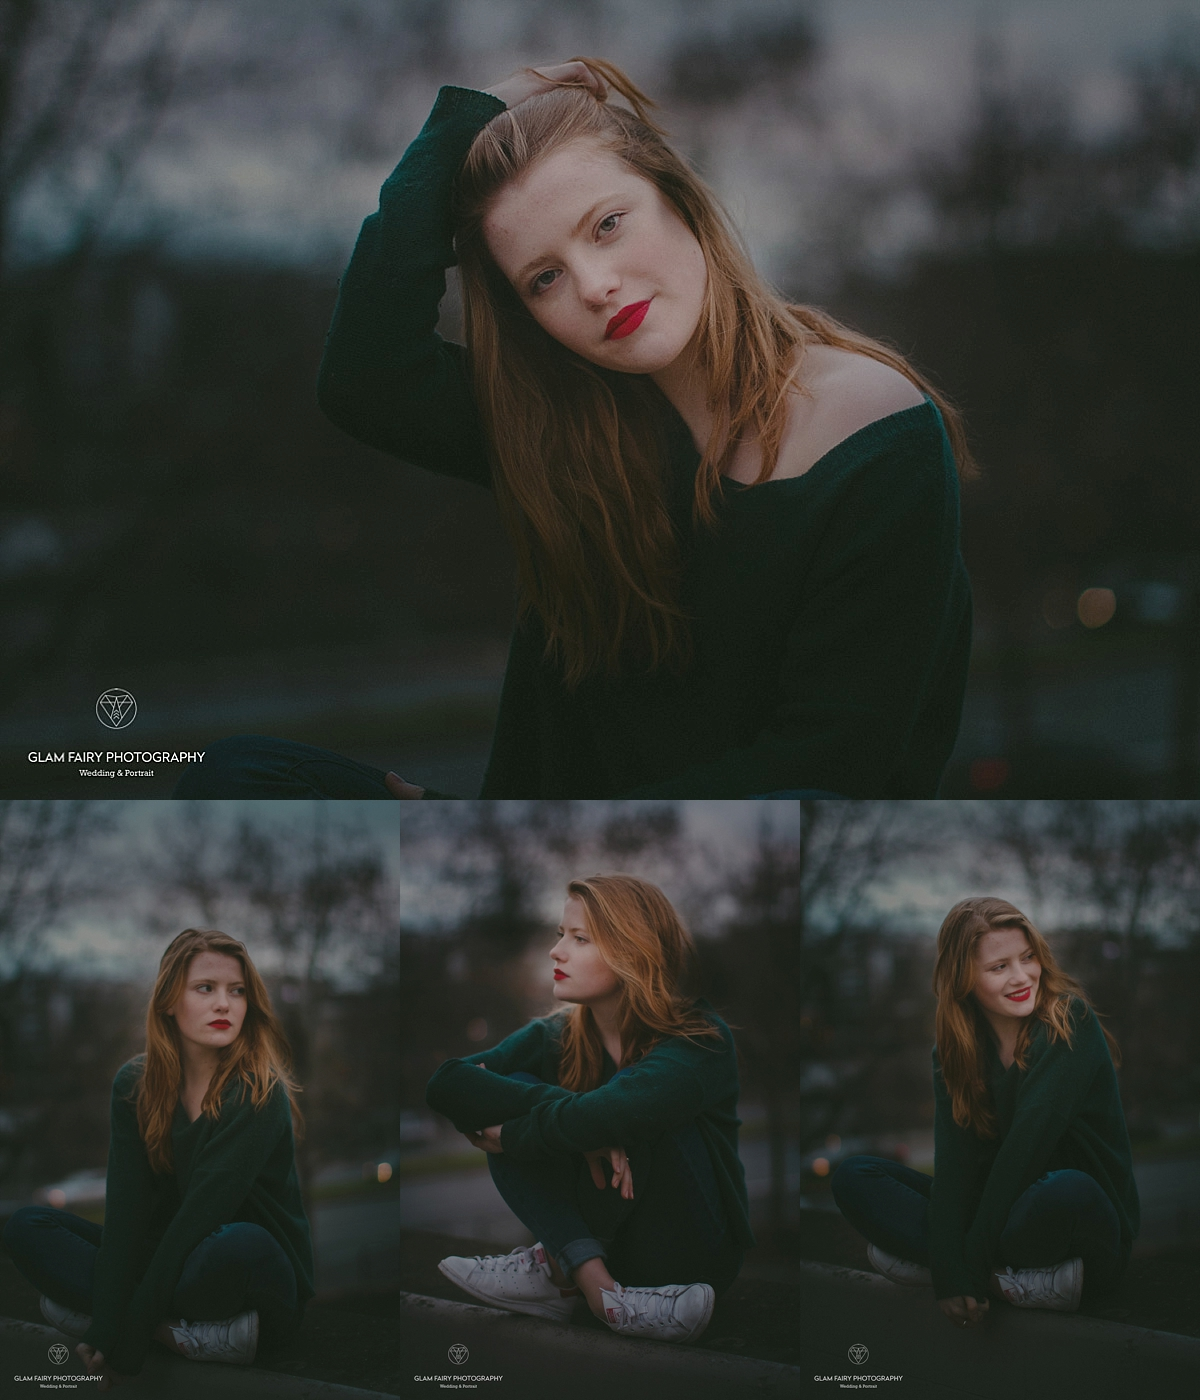 GlamFairyPhotography-seance-portrait-femme-bnf-mona_0018